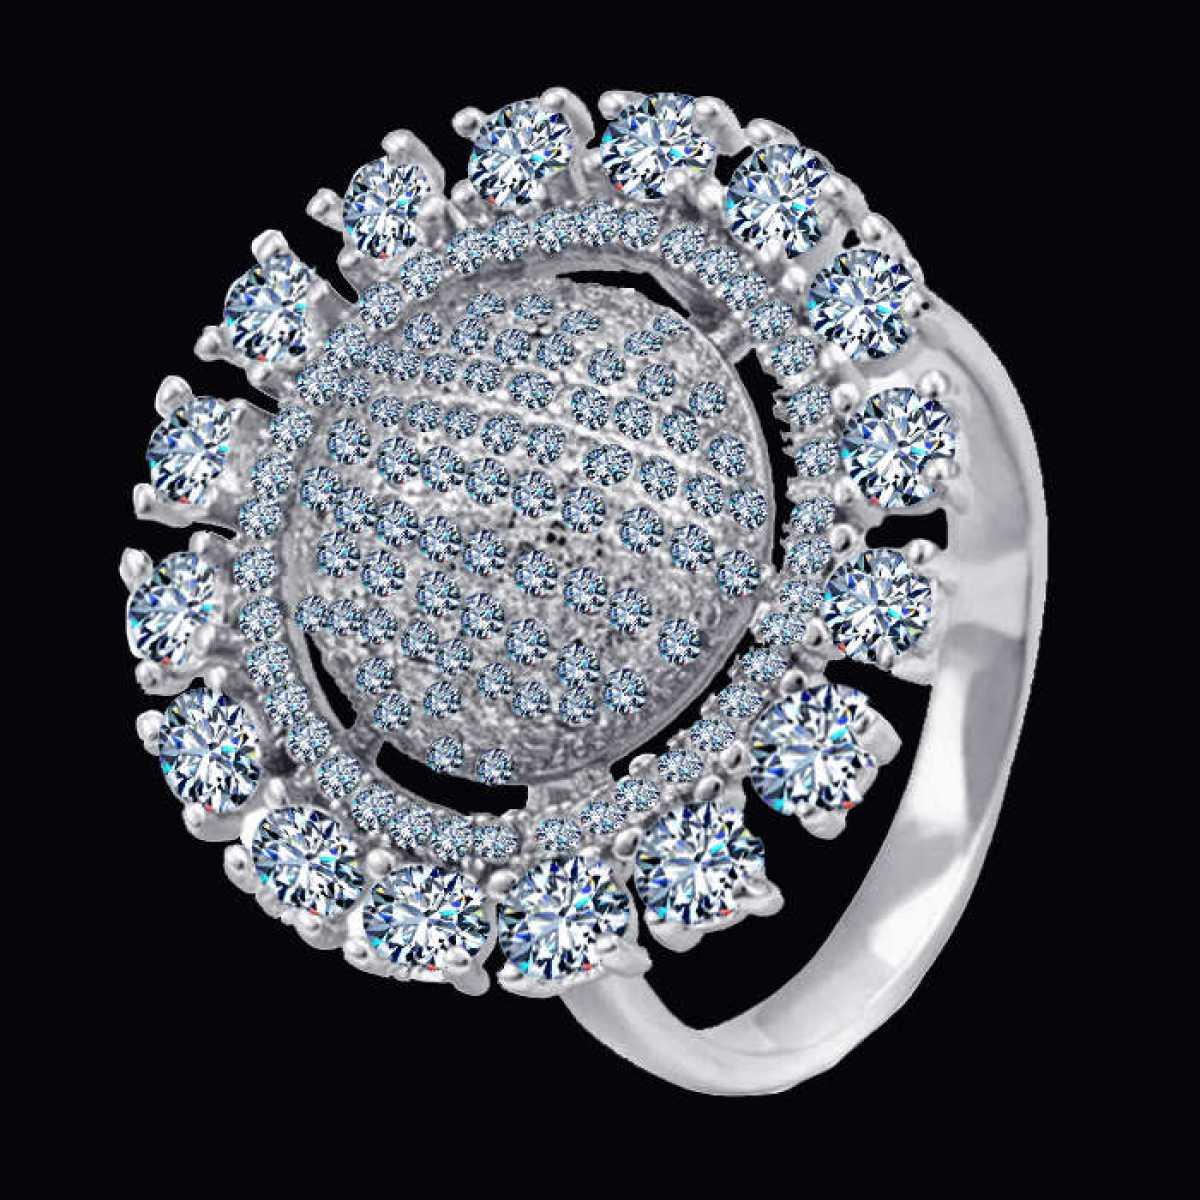 Big Soliter diamond sterling silver ring